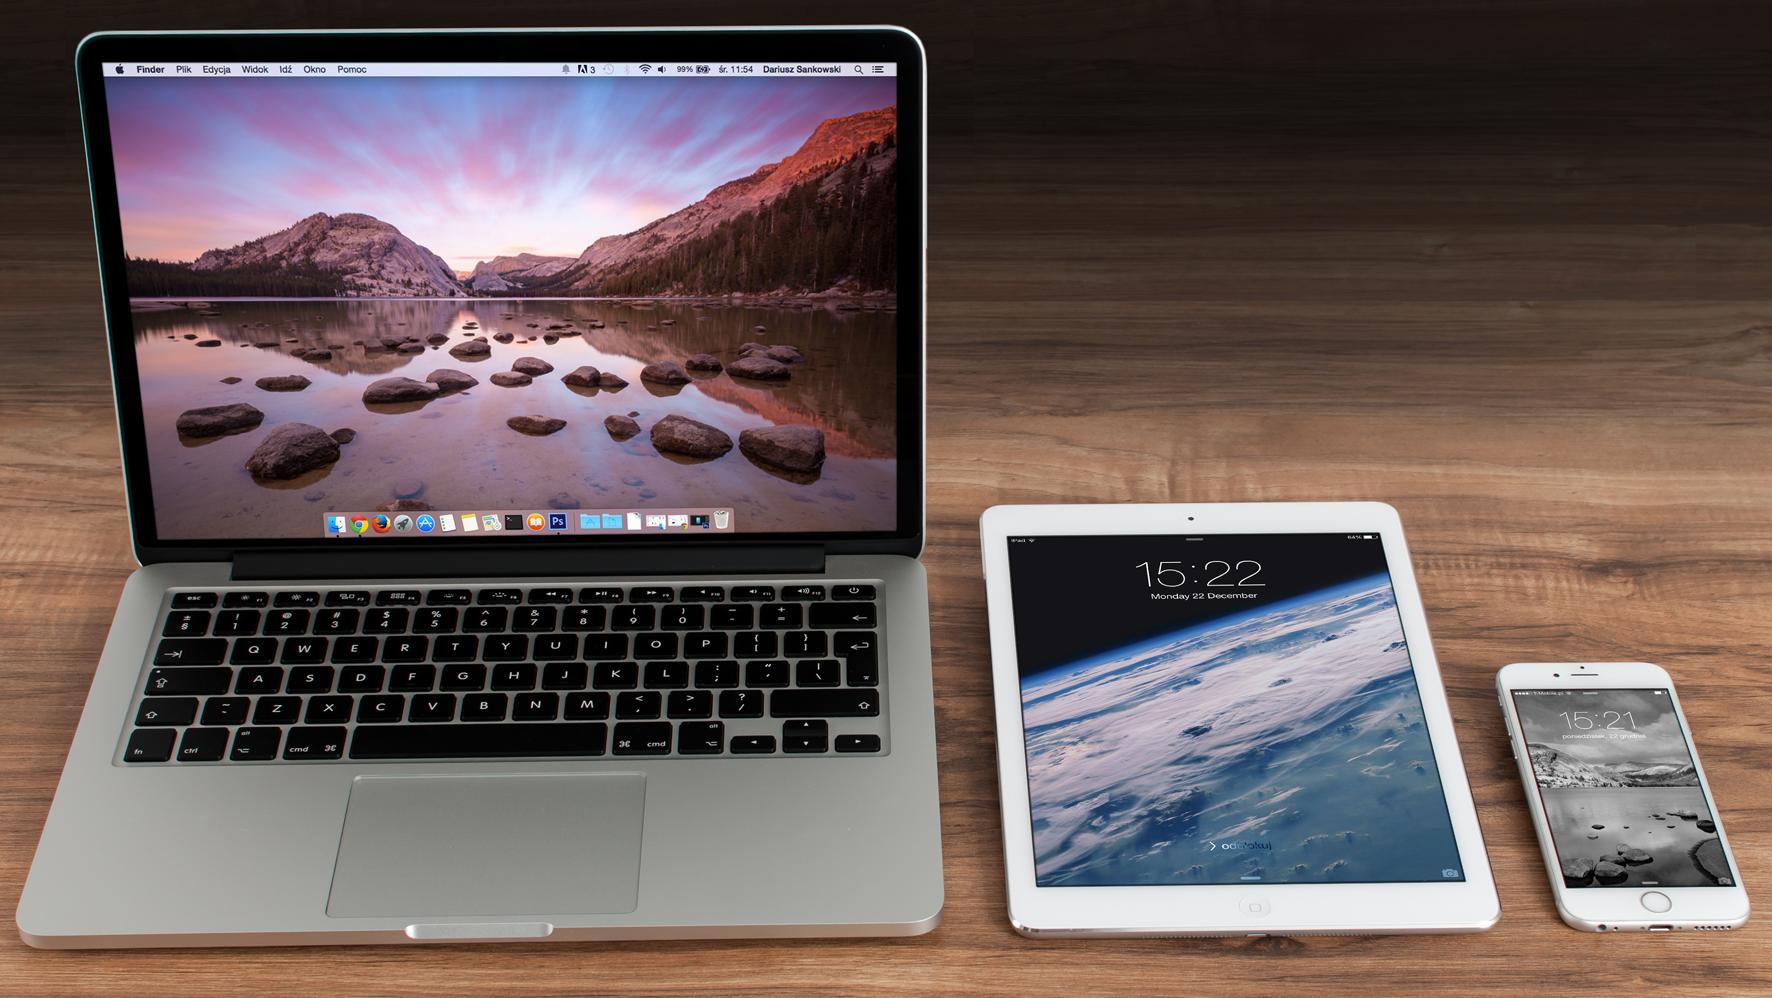 Macbook, iPad & iPhone